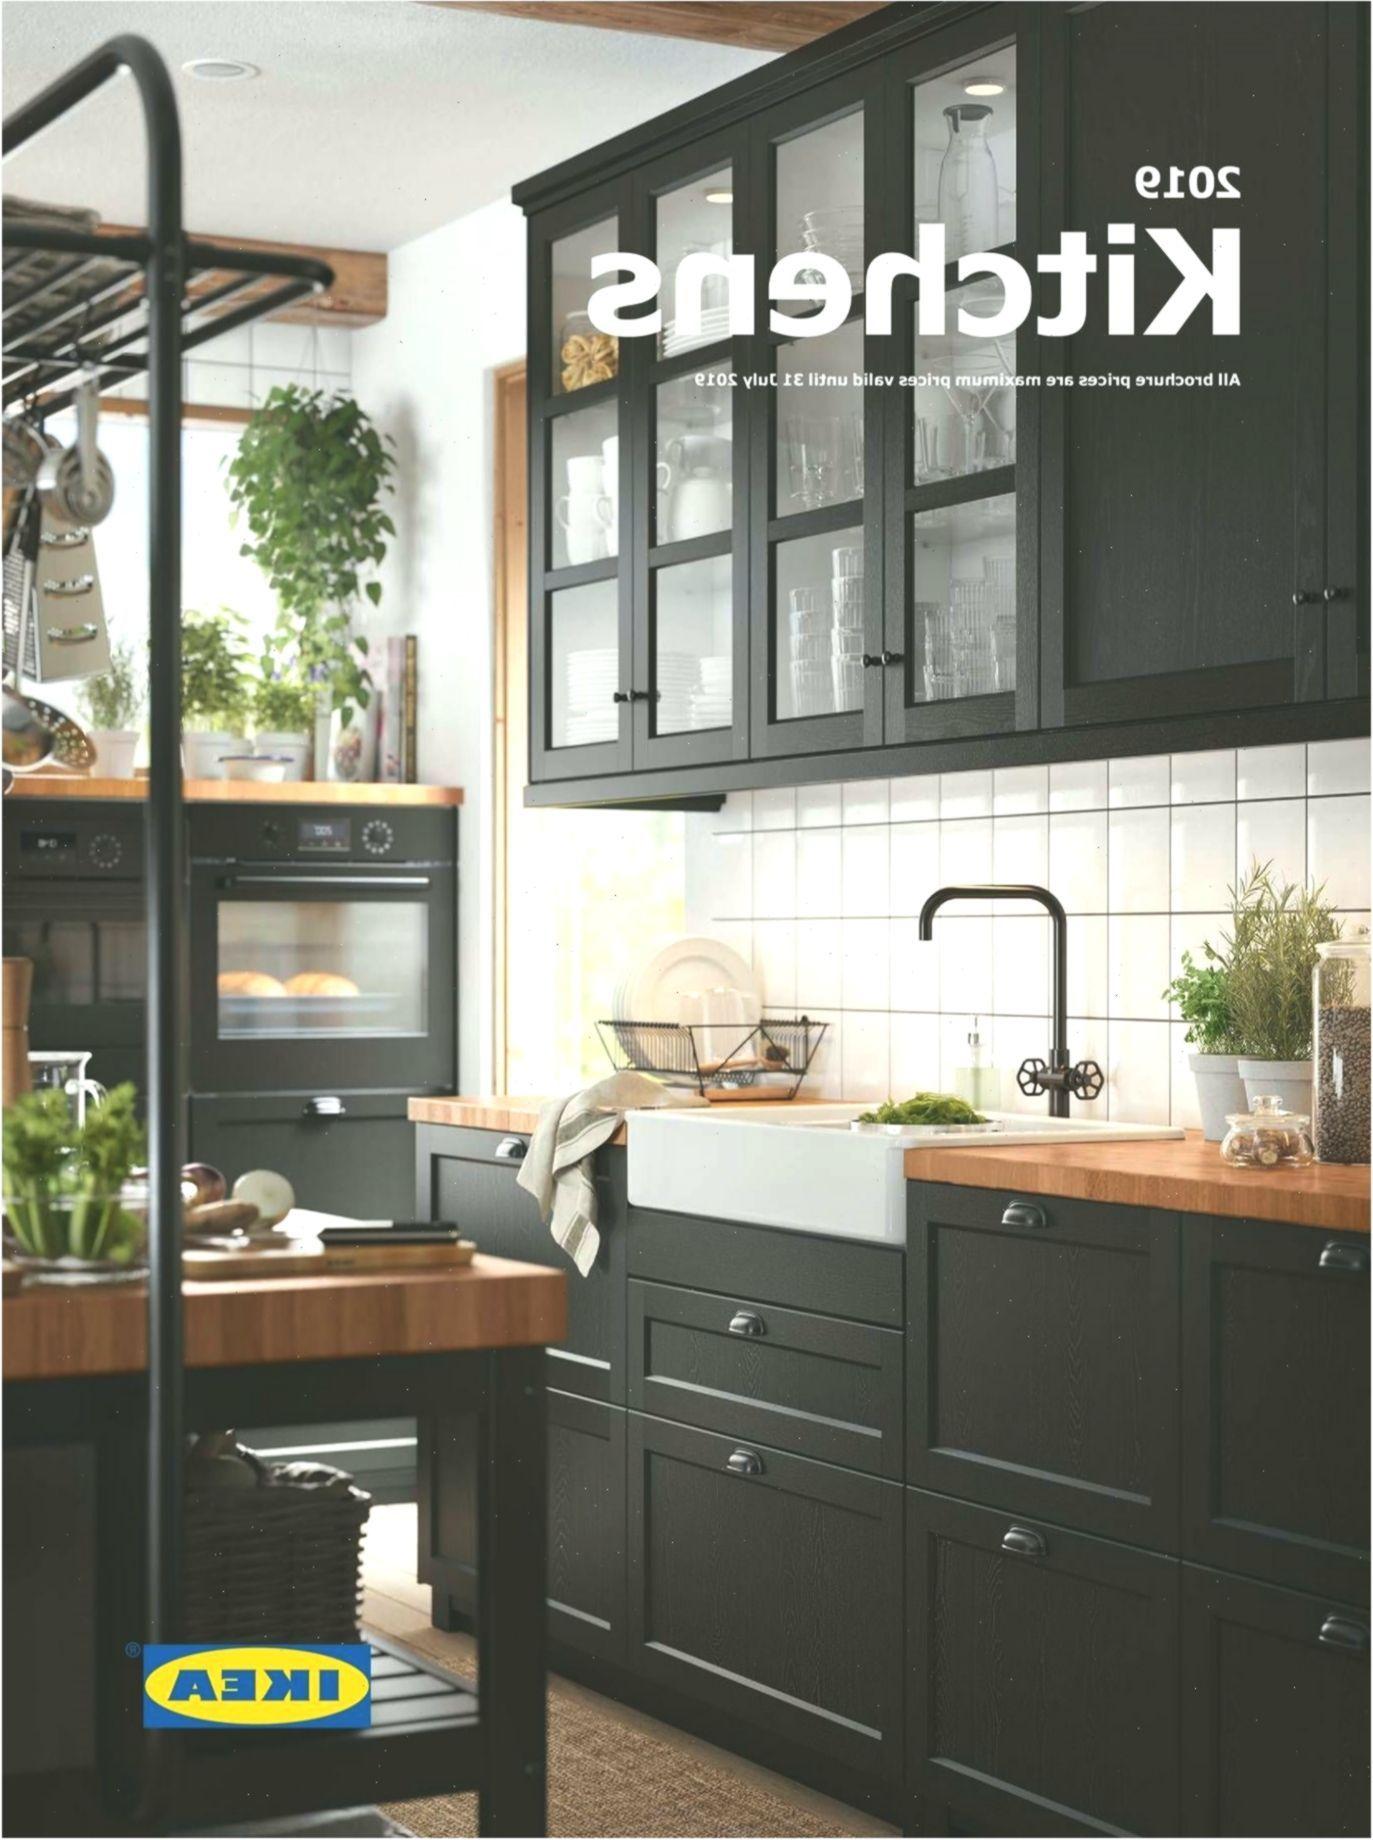 Awesome Ikea Kitchens 2019 Ideas Kche Kitchen2019 Awesome Ideas Ikea Kche Kitchen2019 Kitchens In 2020 Ikea Kitchen Ikea Kitchen Catalogue Design Your Kitchen